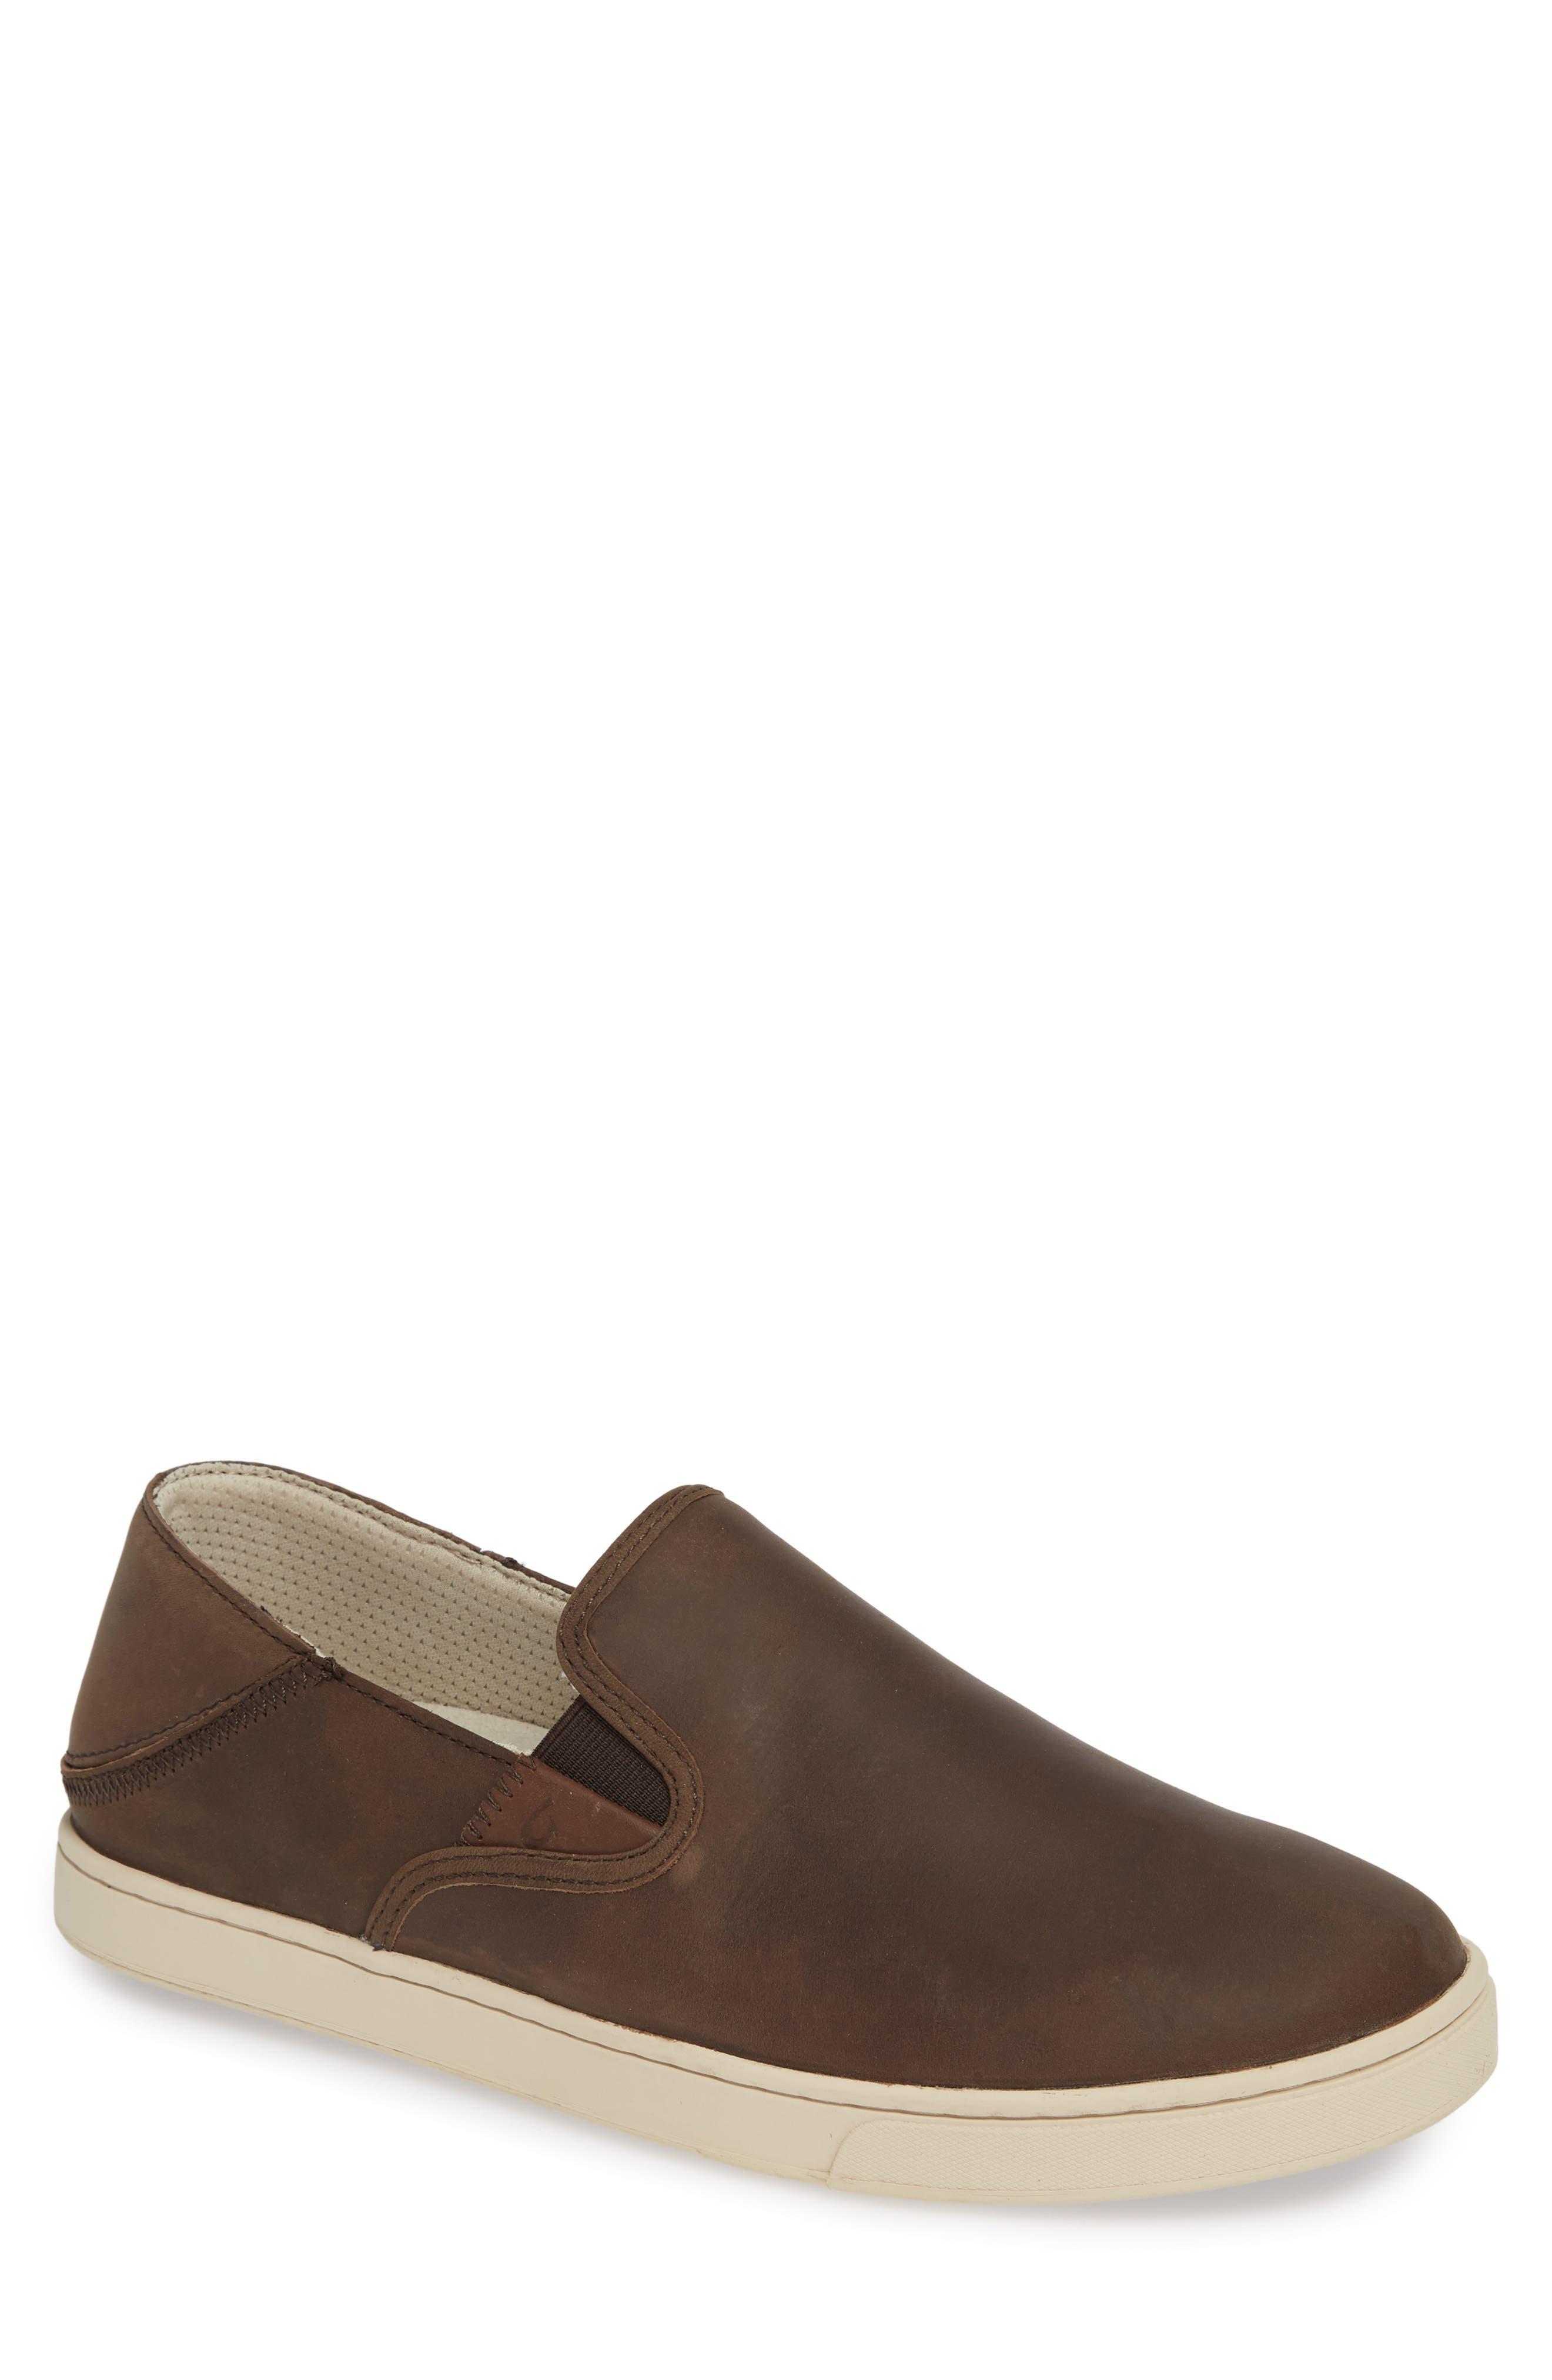 Kahu 'Ili Collapsible Sneaker,                         Main,                         color, DARK WOOD/ TAPA LEATHER